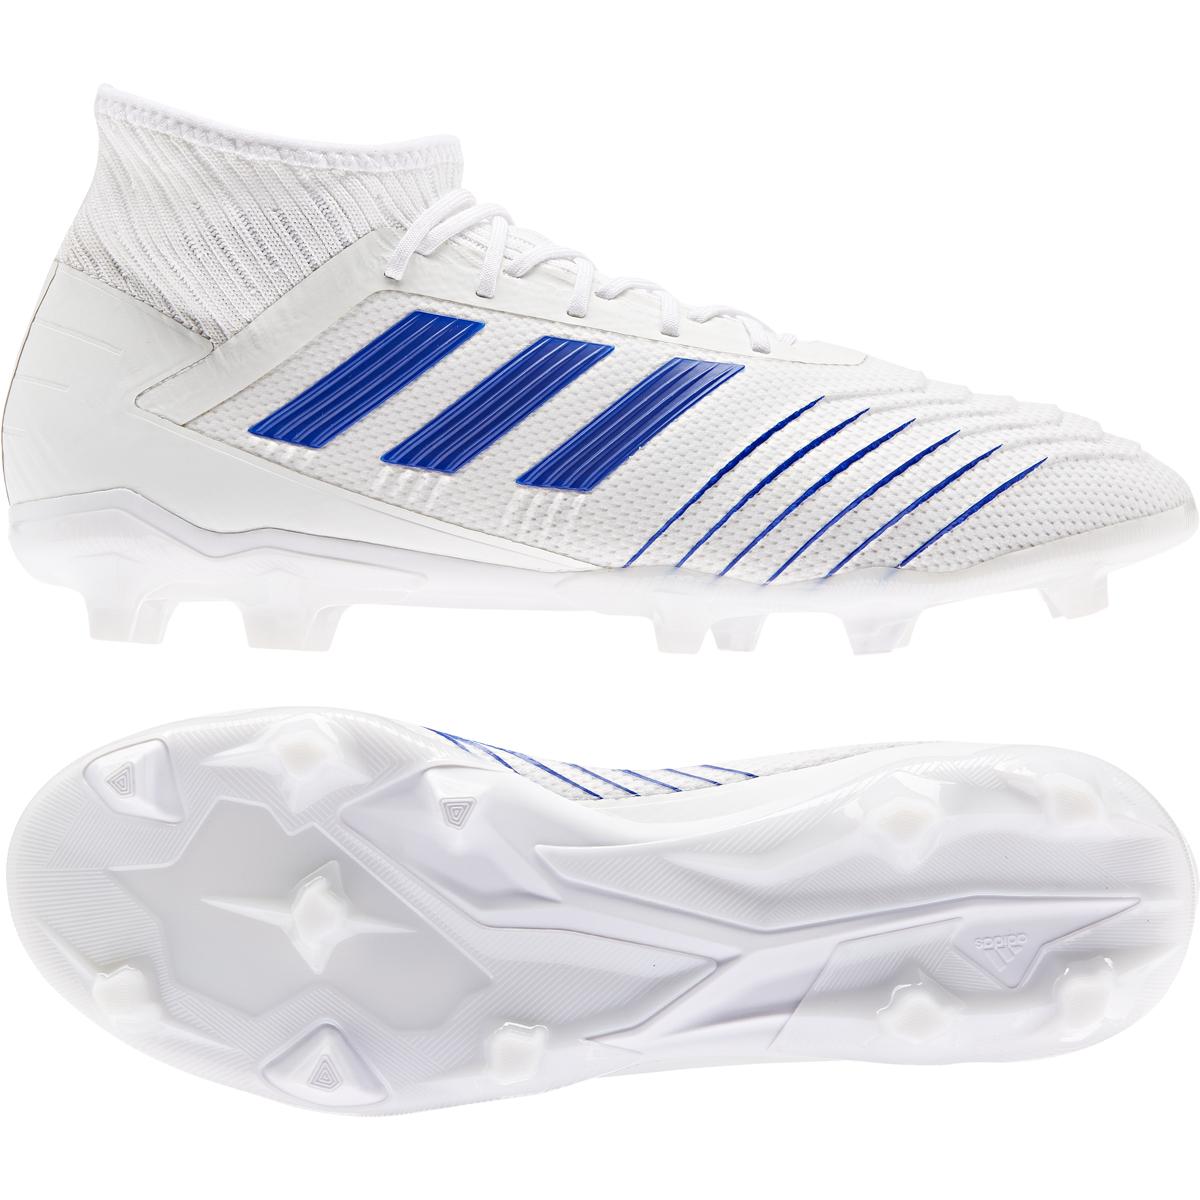 3d579ea376e adidas Predator 19.2 FG Soccer Cleat- White Bold Blue. Sale!